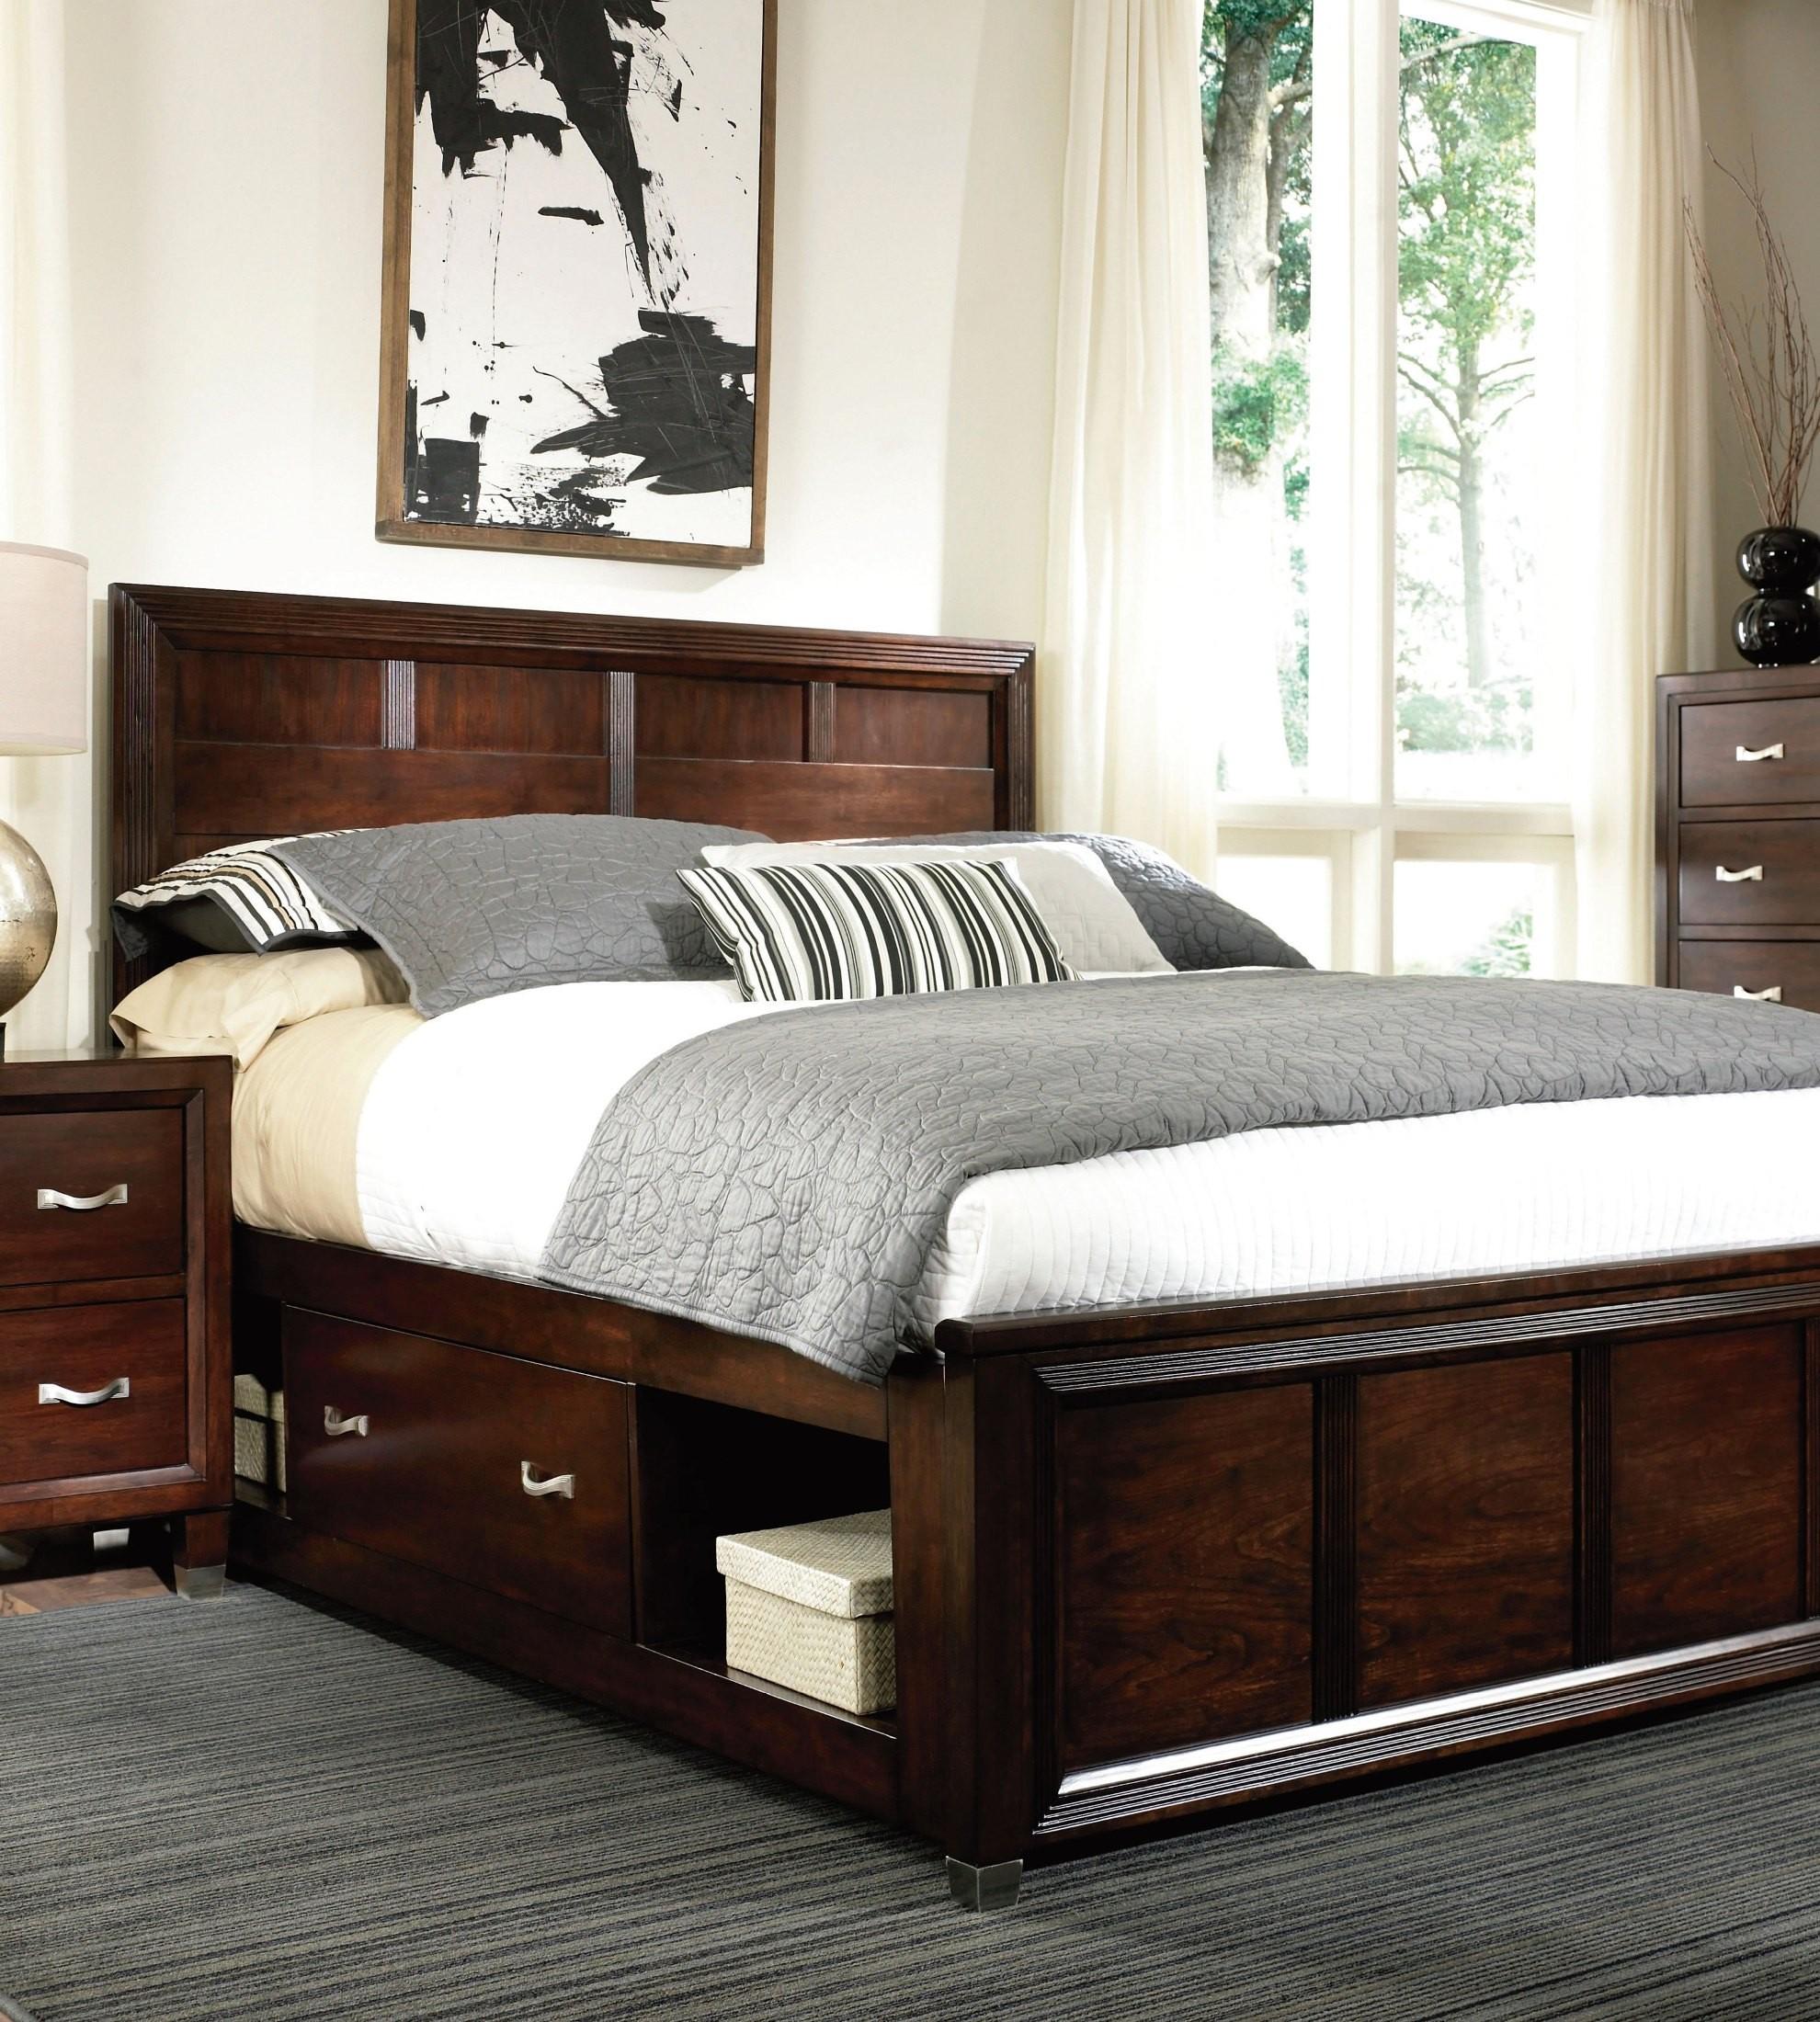 eastlake 2 storage panel bedroom set 4264 250 261 477 478 broyhill